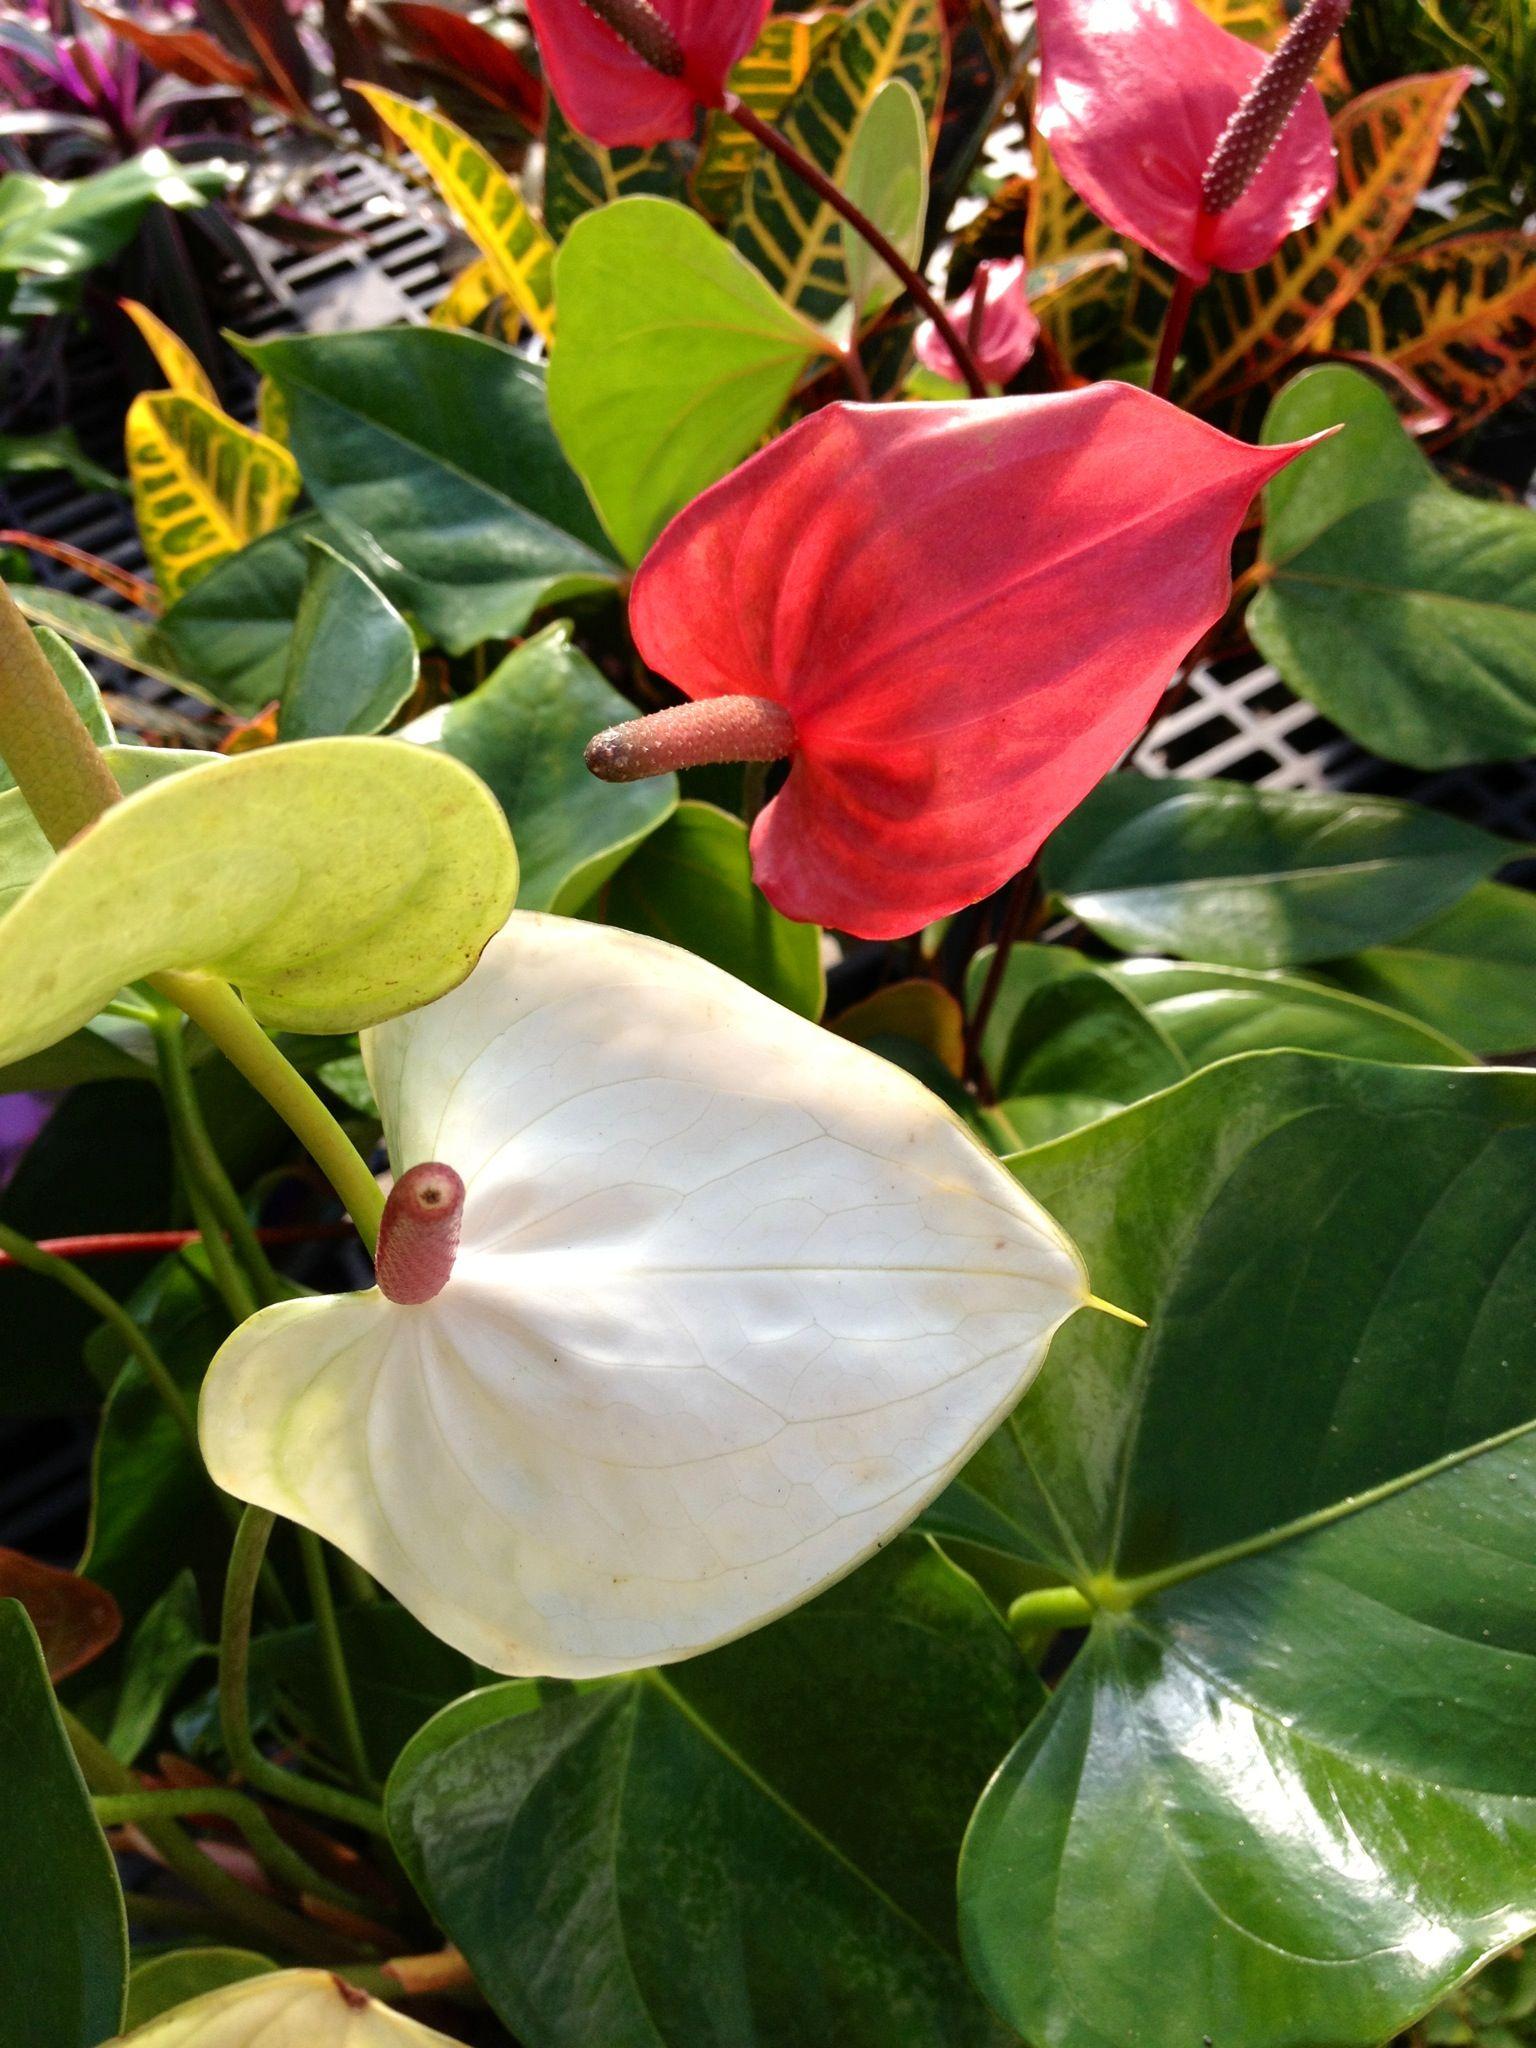 Anthurium Anthurium Plant Leaves Garden